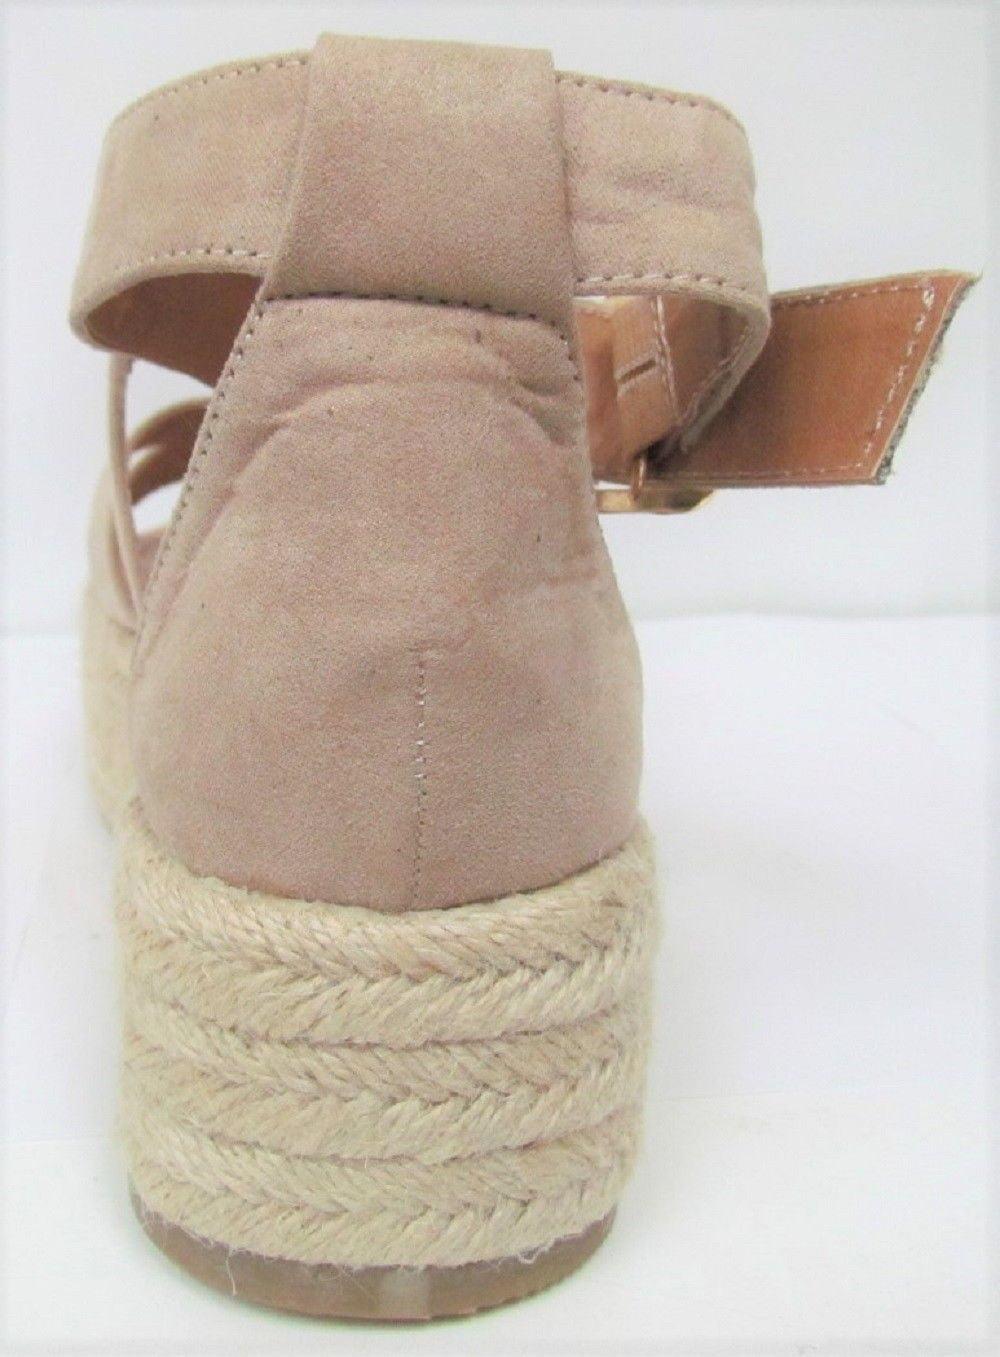 0f2568c9ccb Bonnible - Fatima-1 Espadrille Flatform Platform Strappy Gladiator Sandal  Nude - Walmart.com